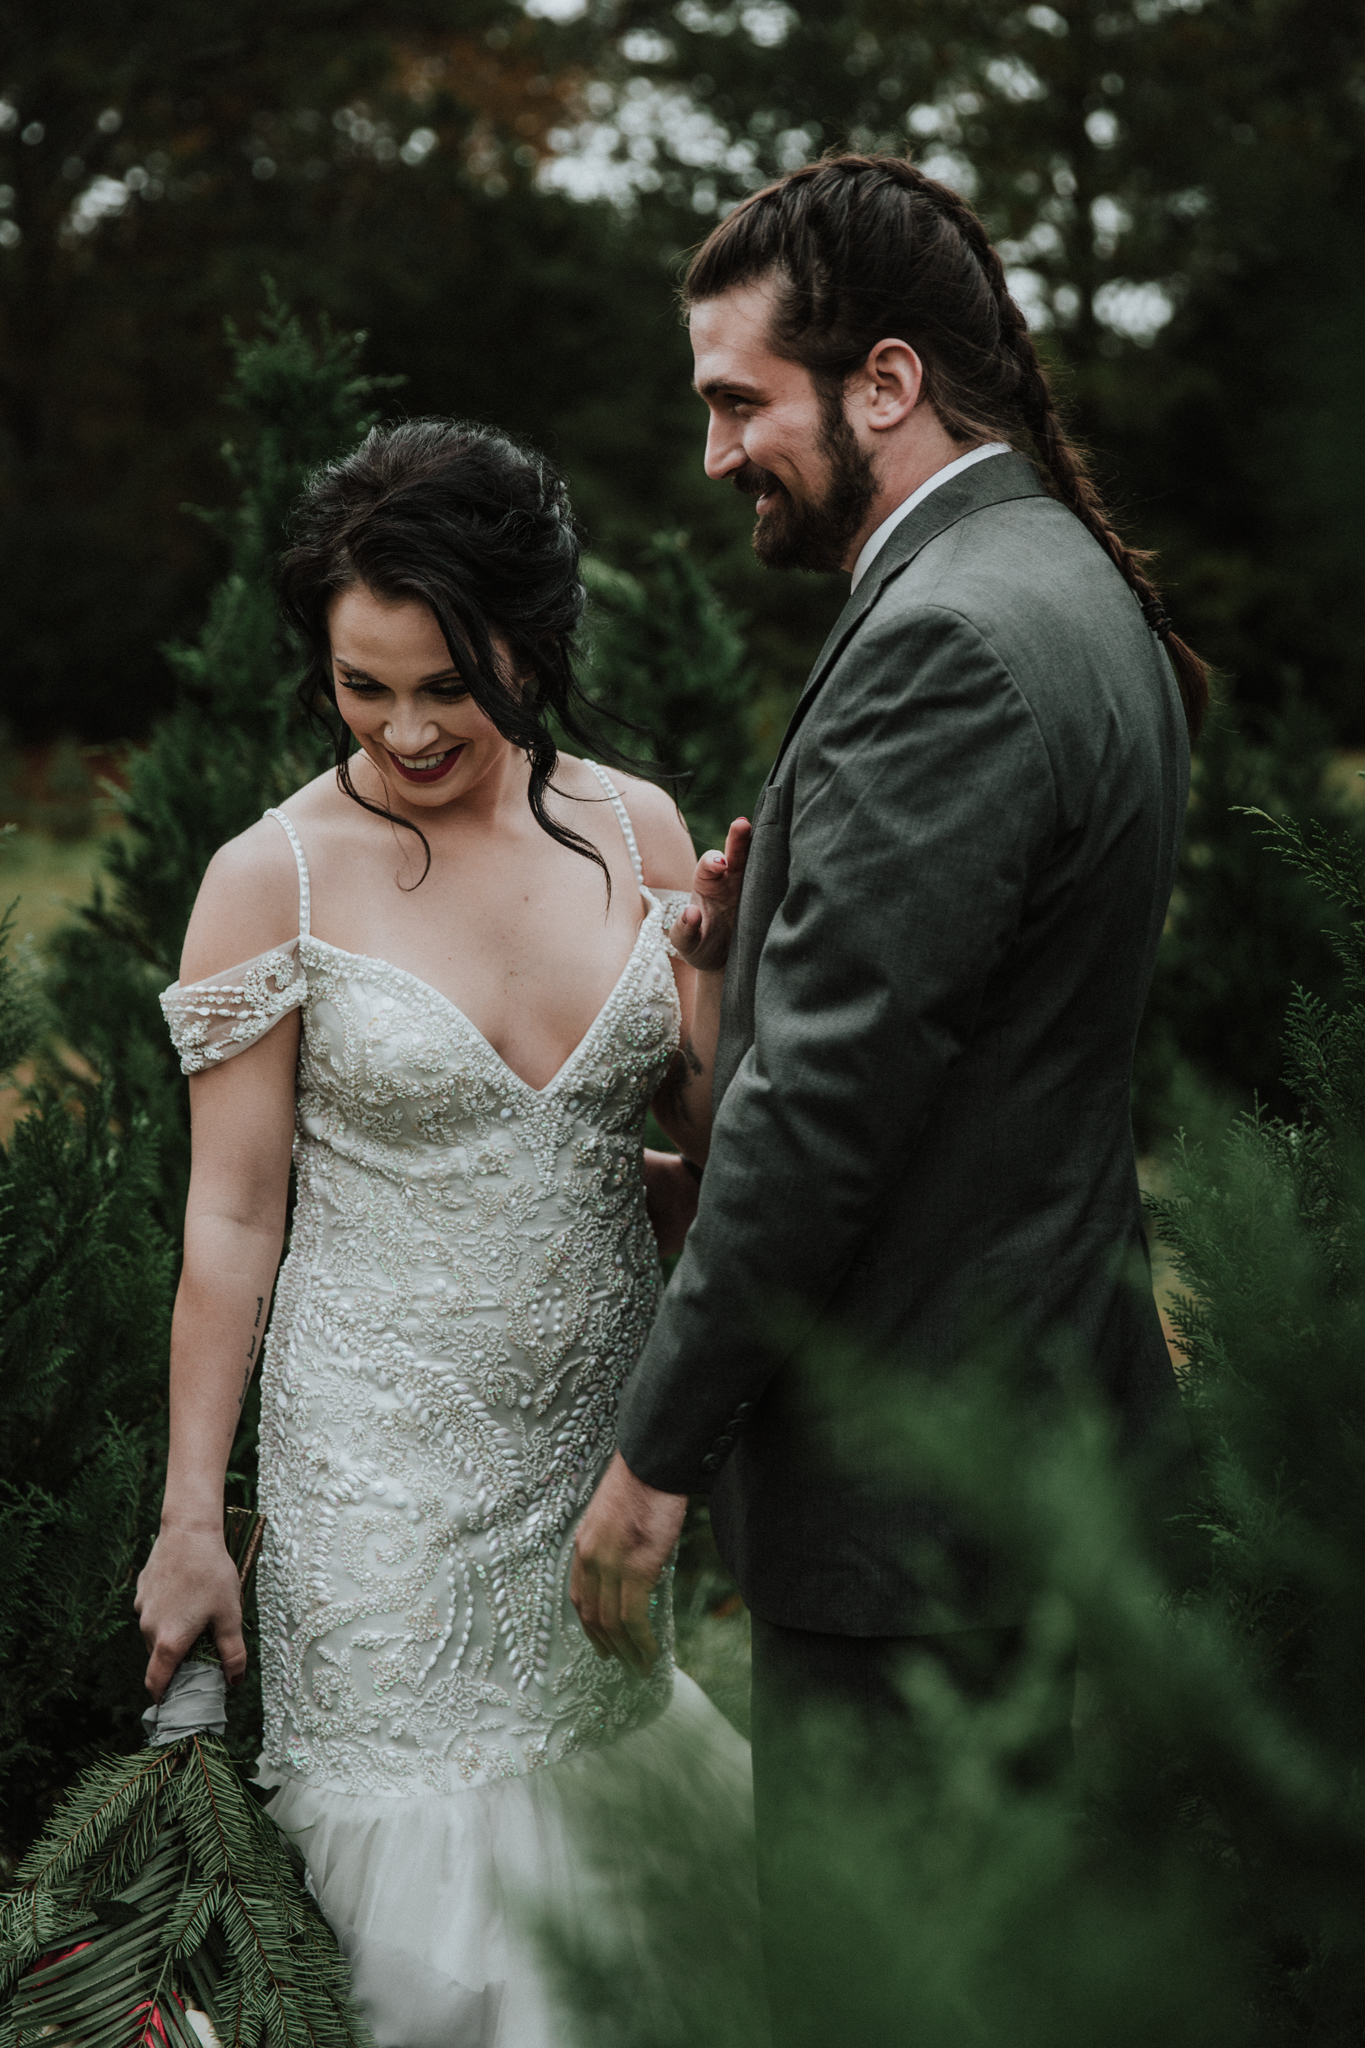 Georgia-Couples-Winter-Engagement-Wedding-26.jpg